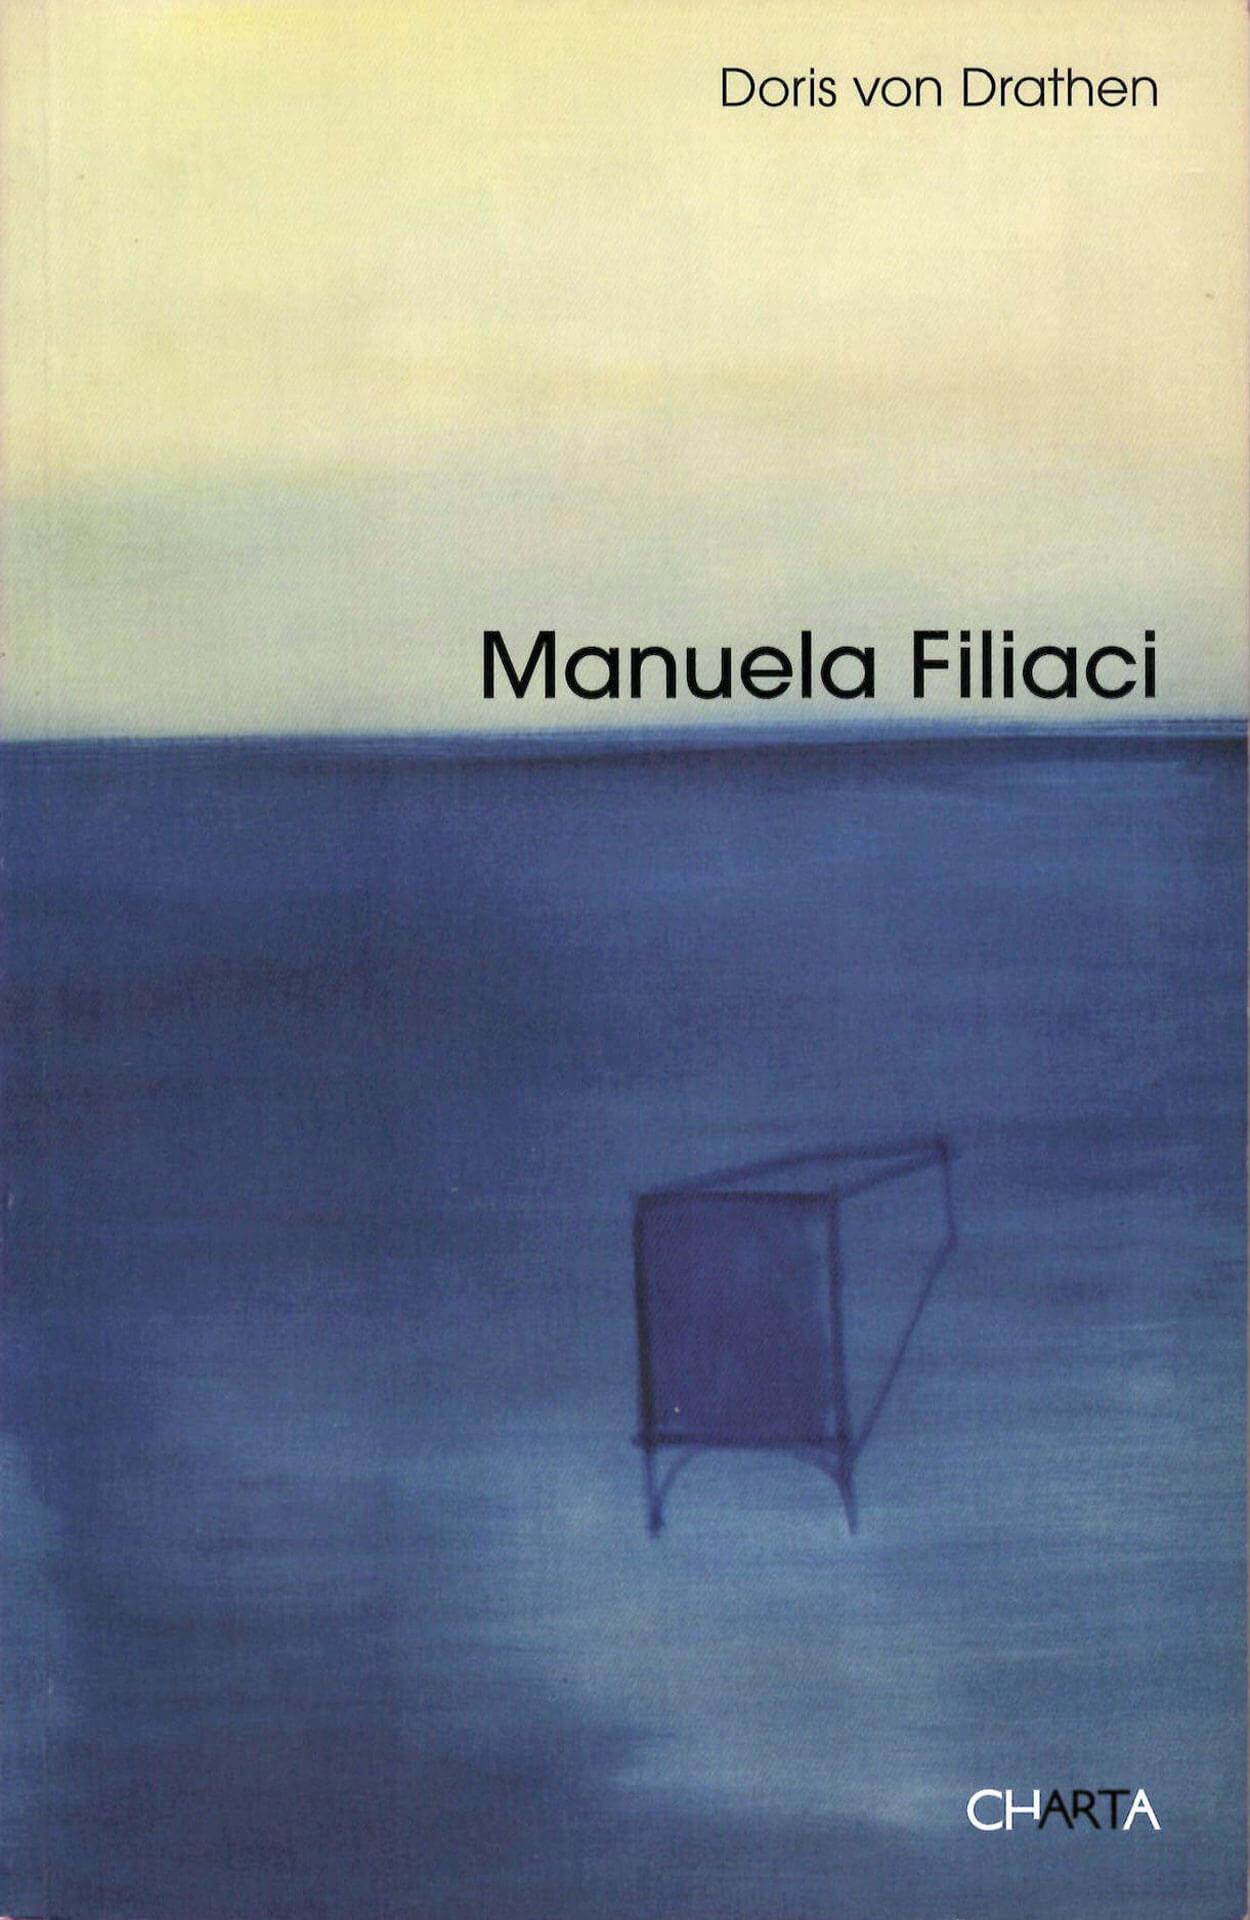 Studio Stefania Miscetti | Catalogues | Manuela Filiaci